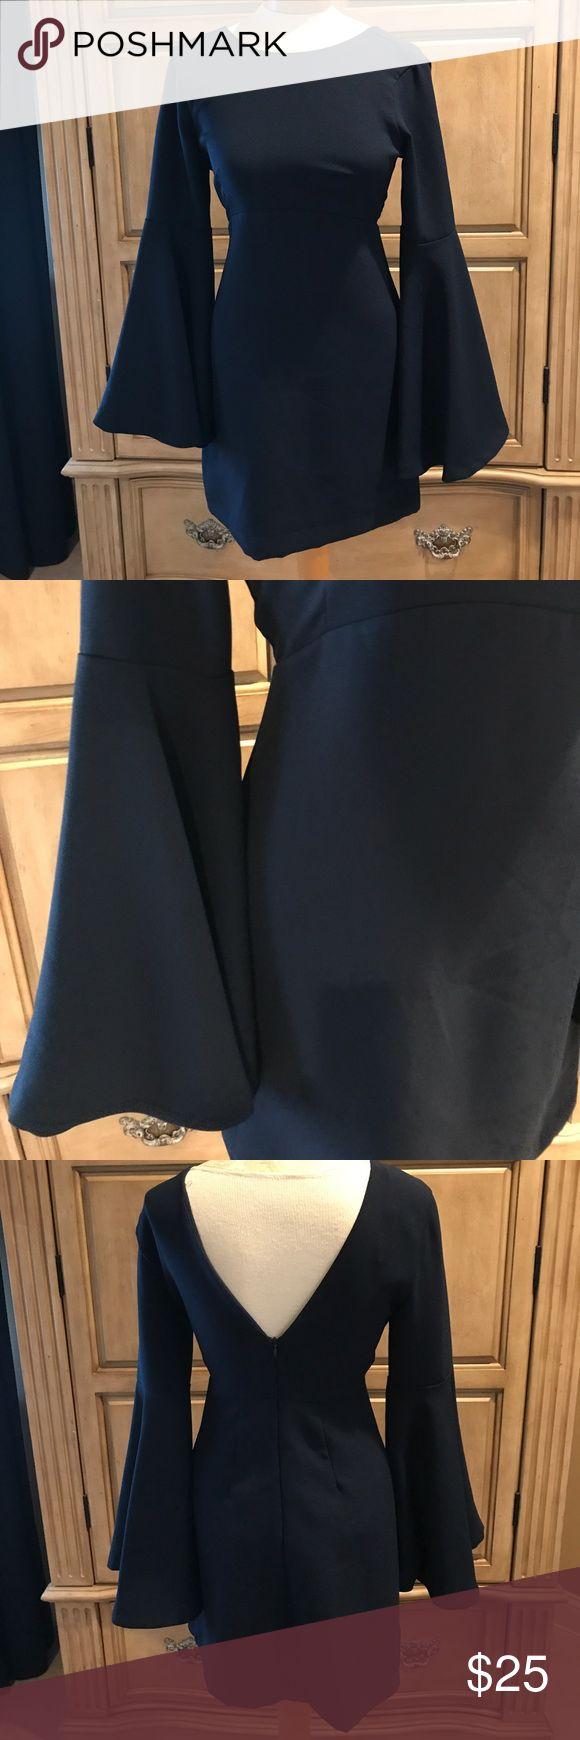 Zara- NAVY BELL SLEEVED TEA LENGTH DRESS ♥️ Navy occasion dress with bell sleeves. Never worn Zara Dresses Long Sleeve